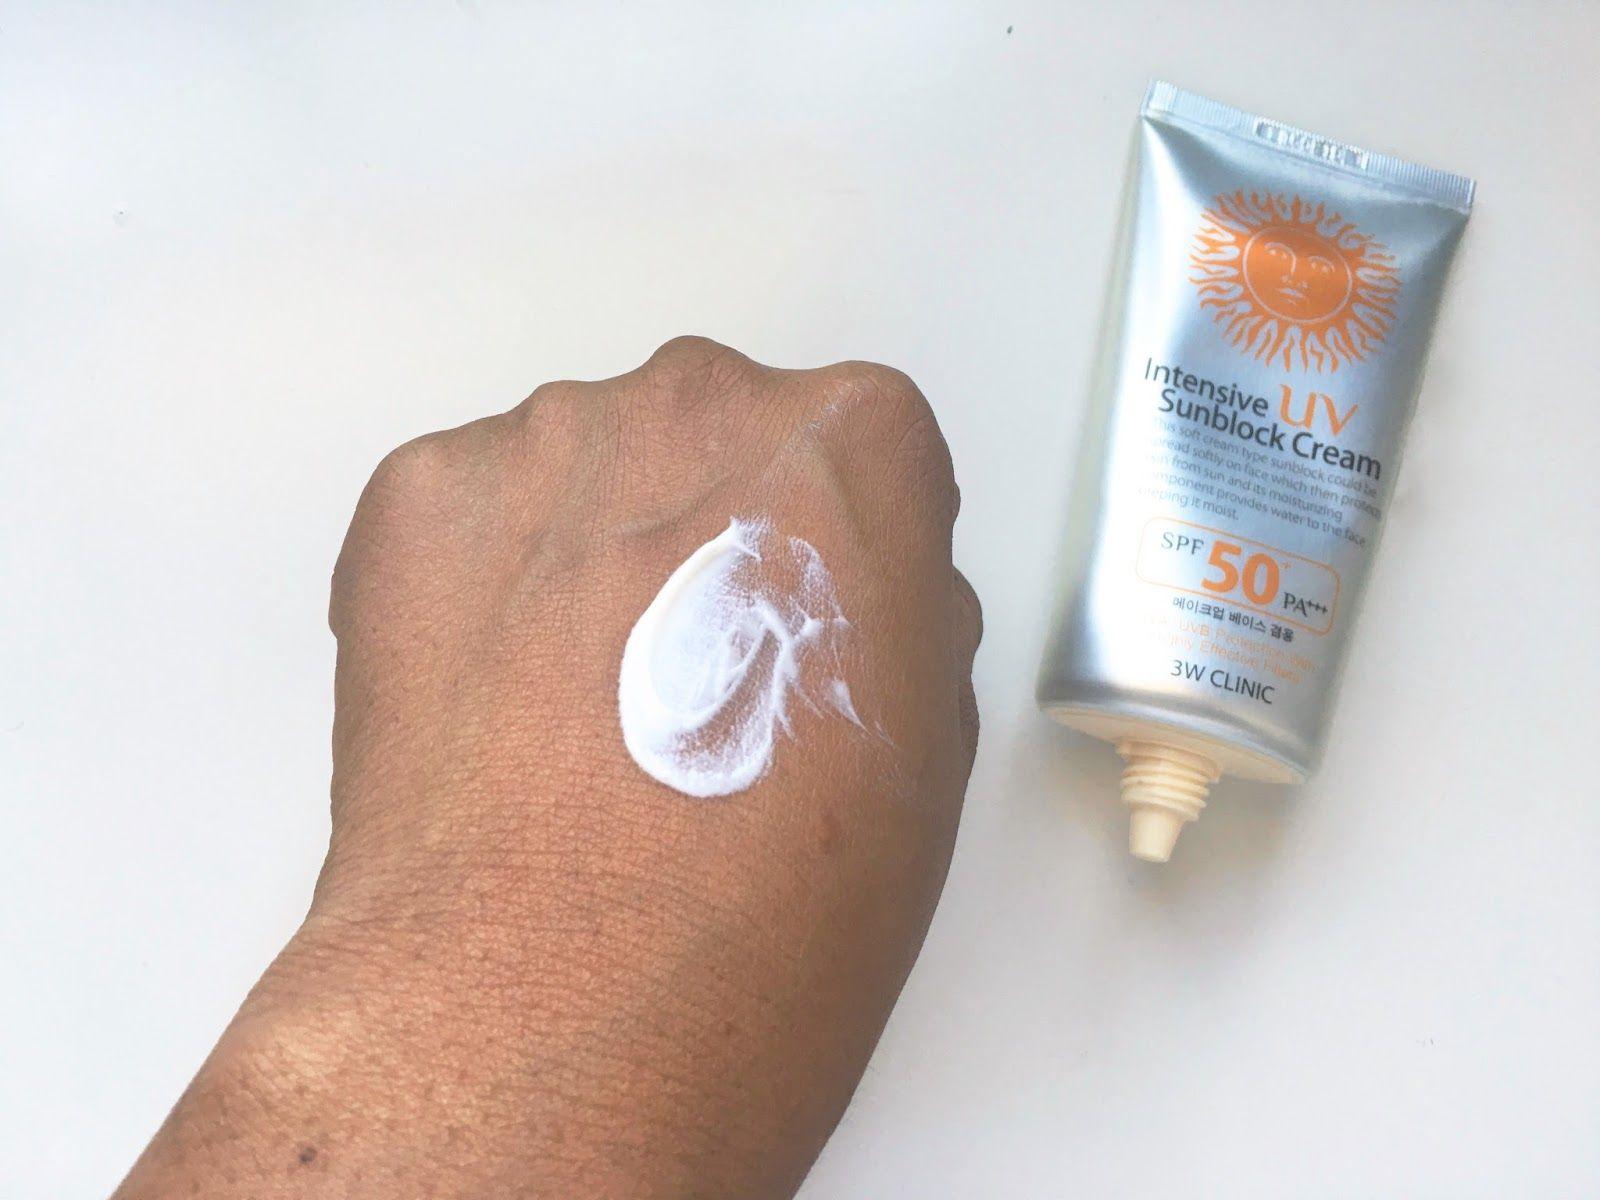 3w Clinic Intensive Uv Sunblock Cream Spf 50 Pa Review Sunblock Love Your Skin Intense